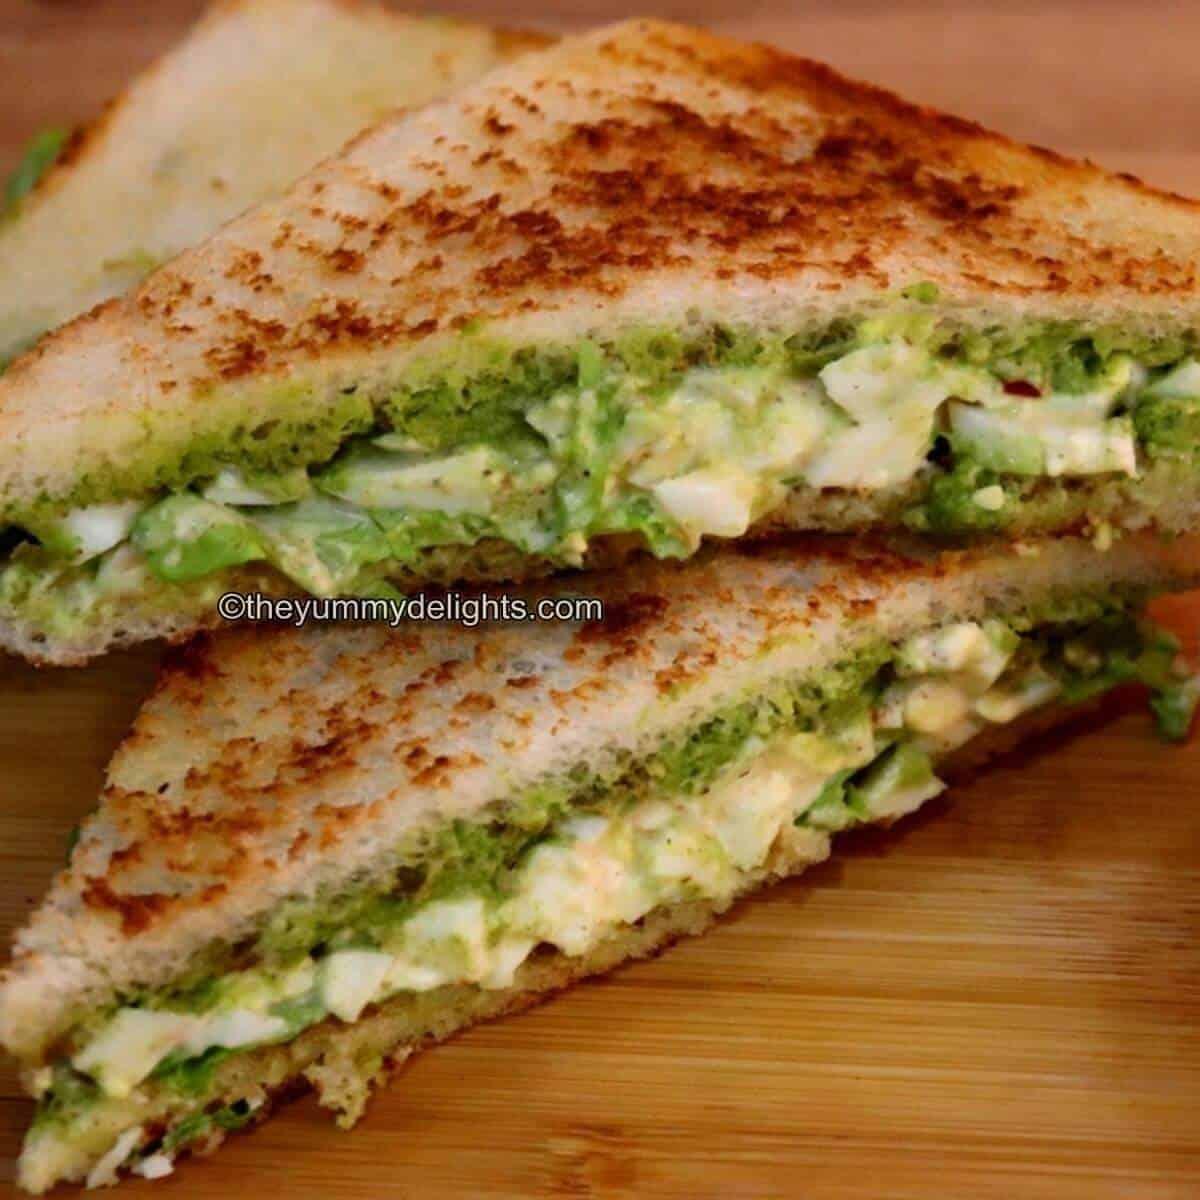 egg salad sandwich placed on a chopping board.